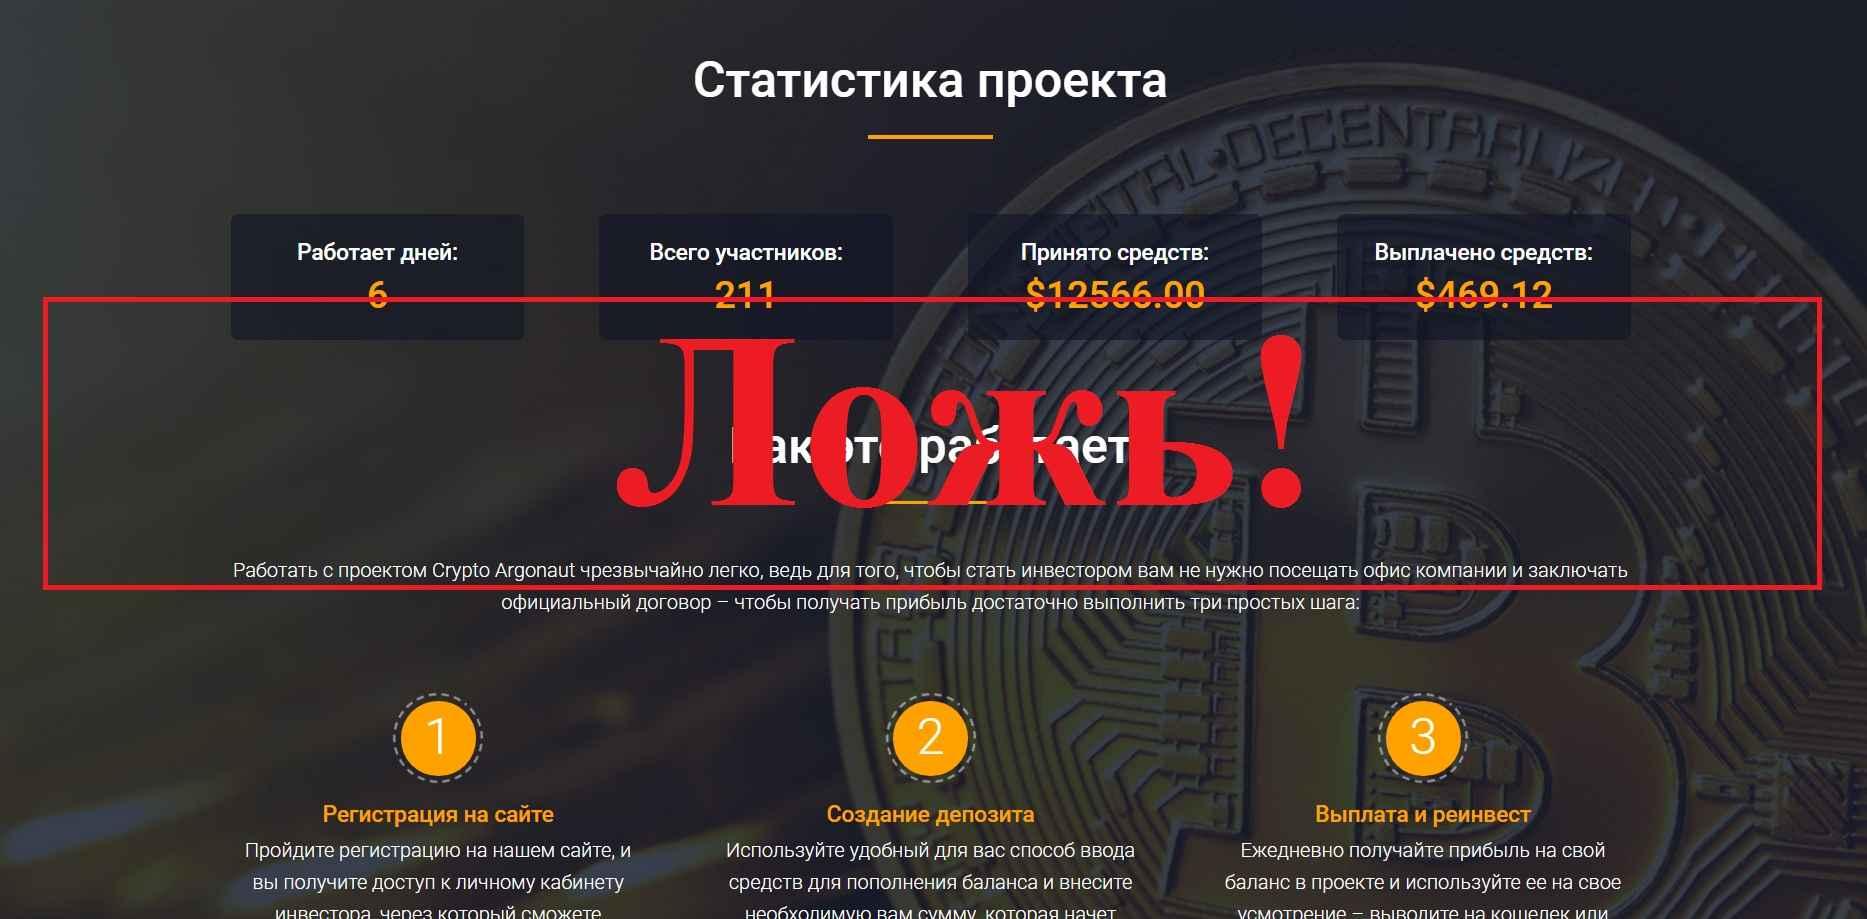 Crypto Argonaut – отзывы и обзор crypto-argonaut.com